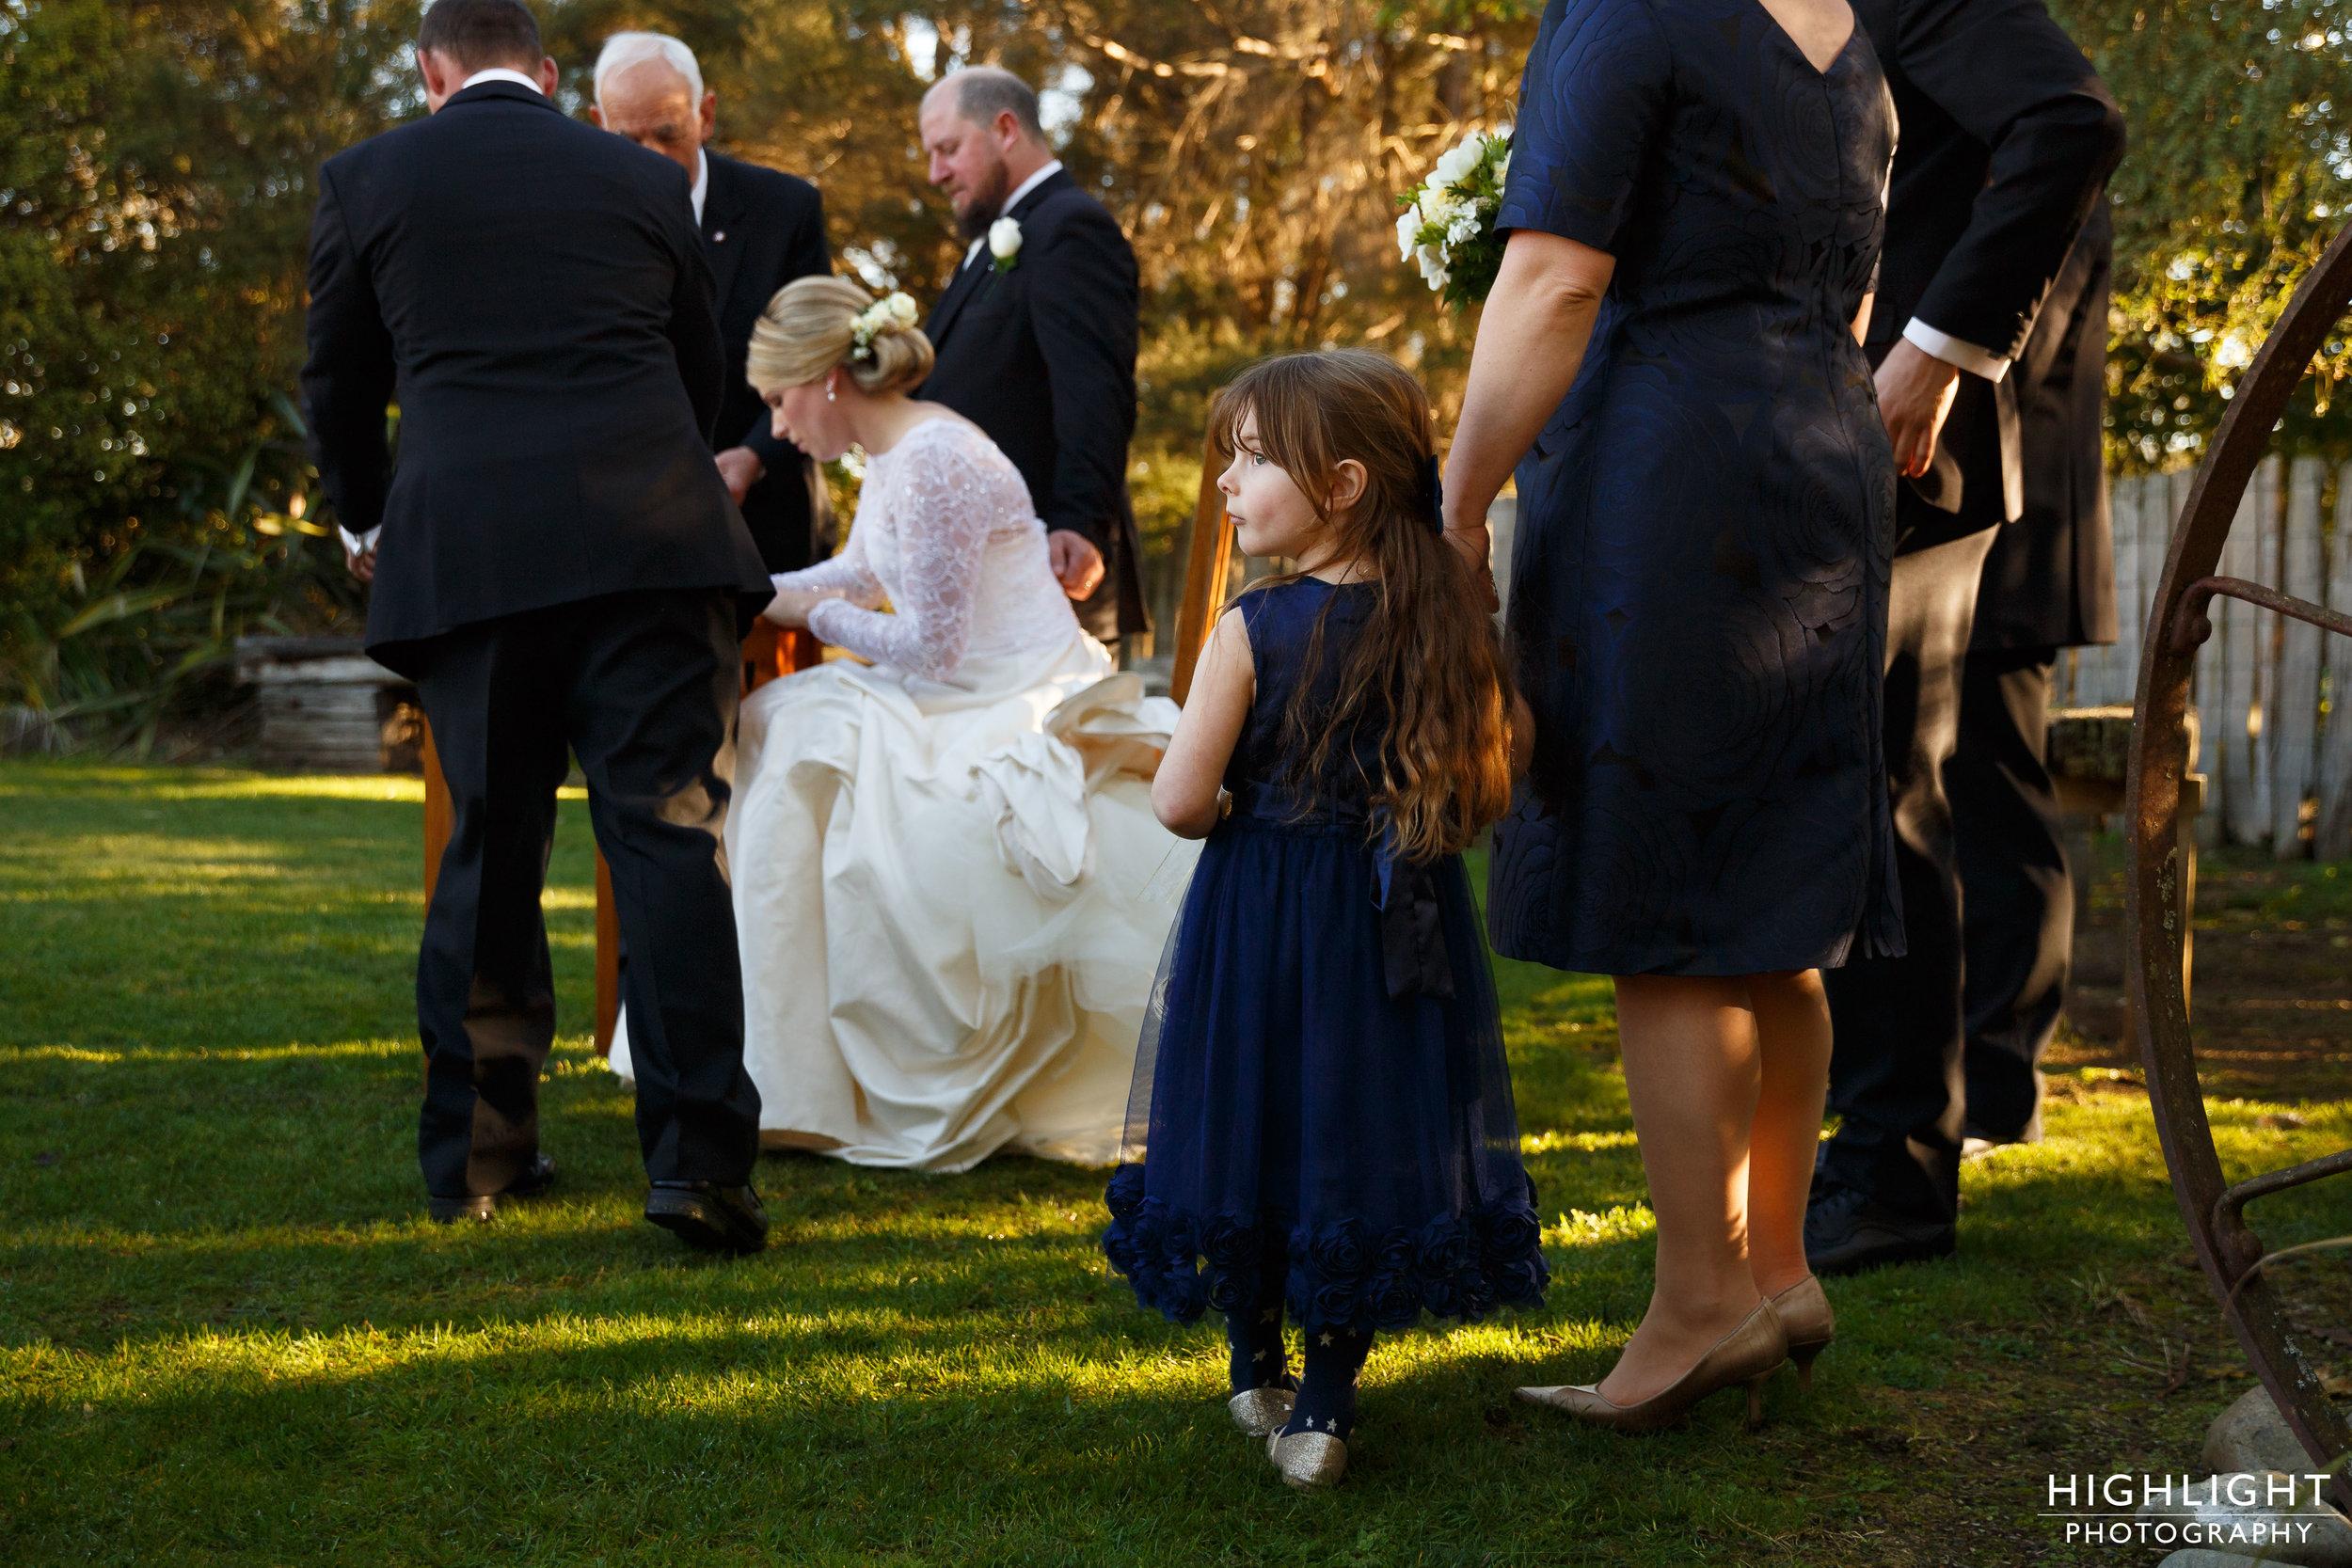 makoura-wedding-photography-highlight-new-zealand-37.jpg